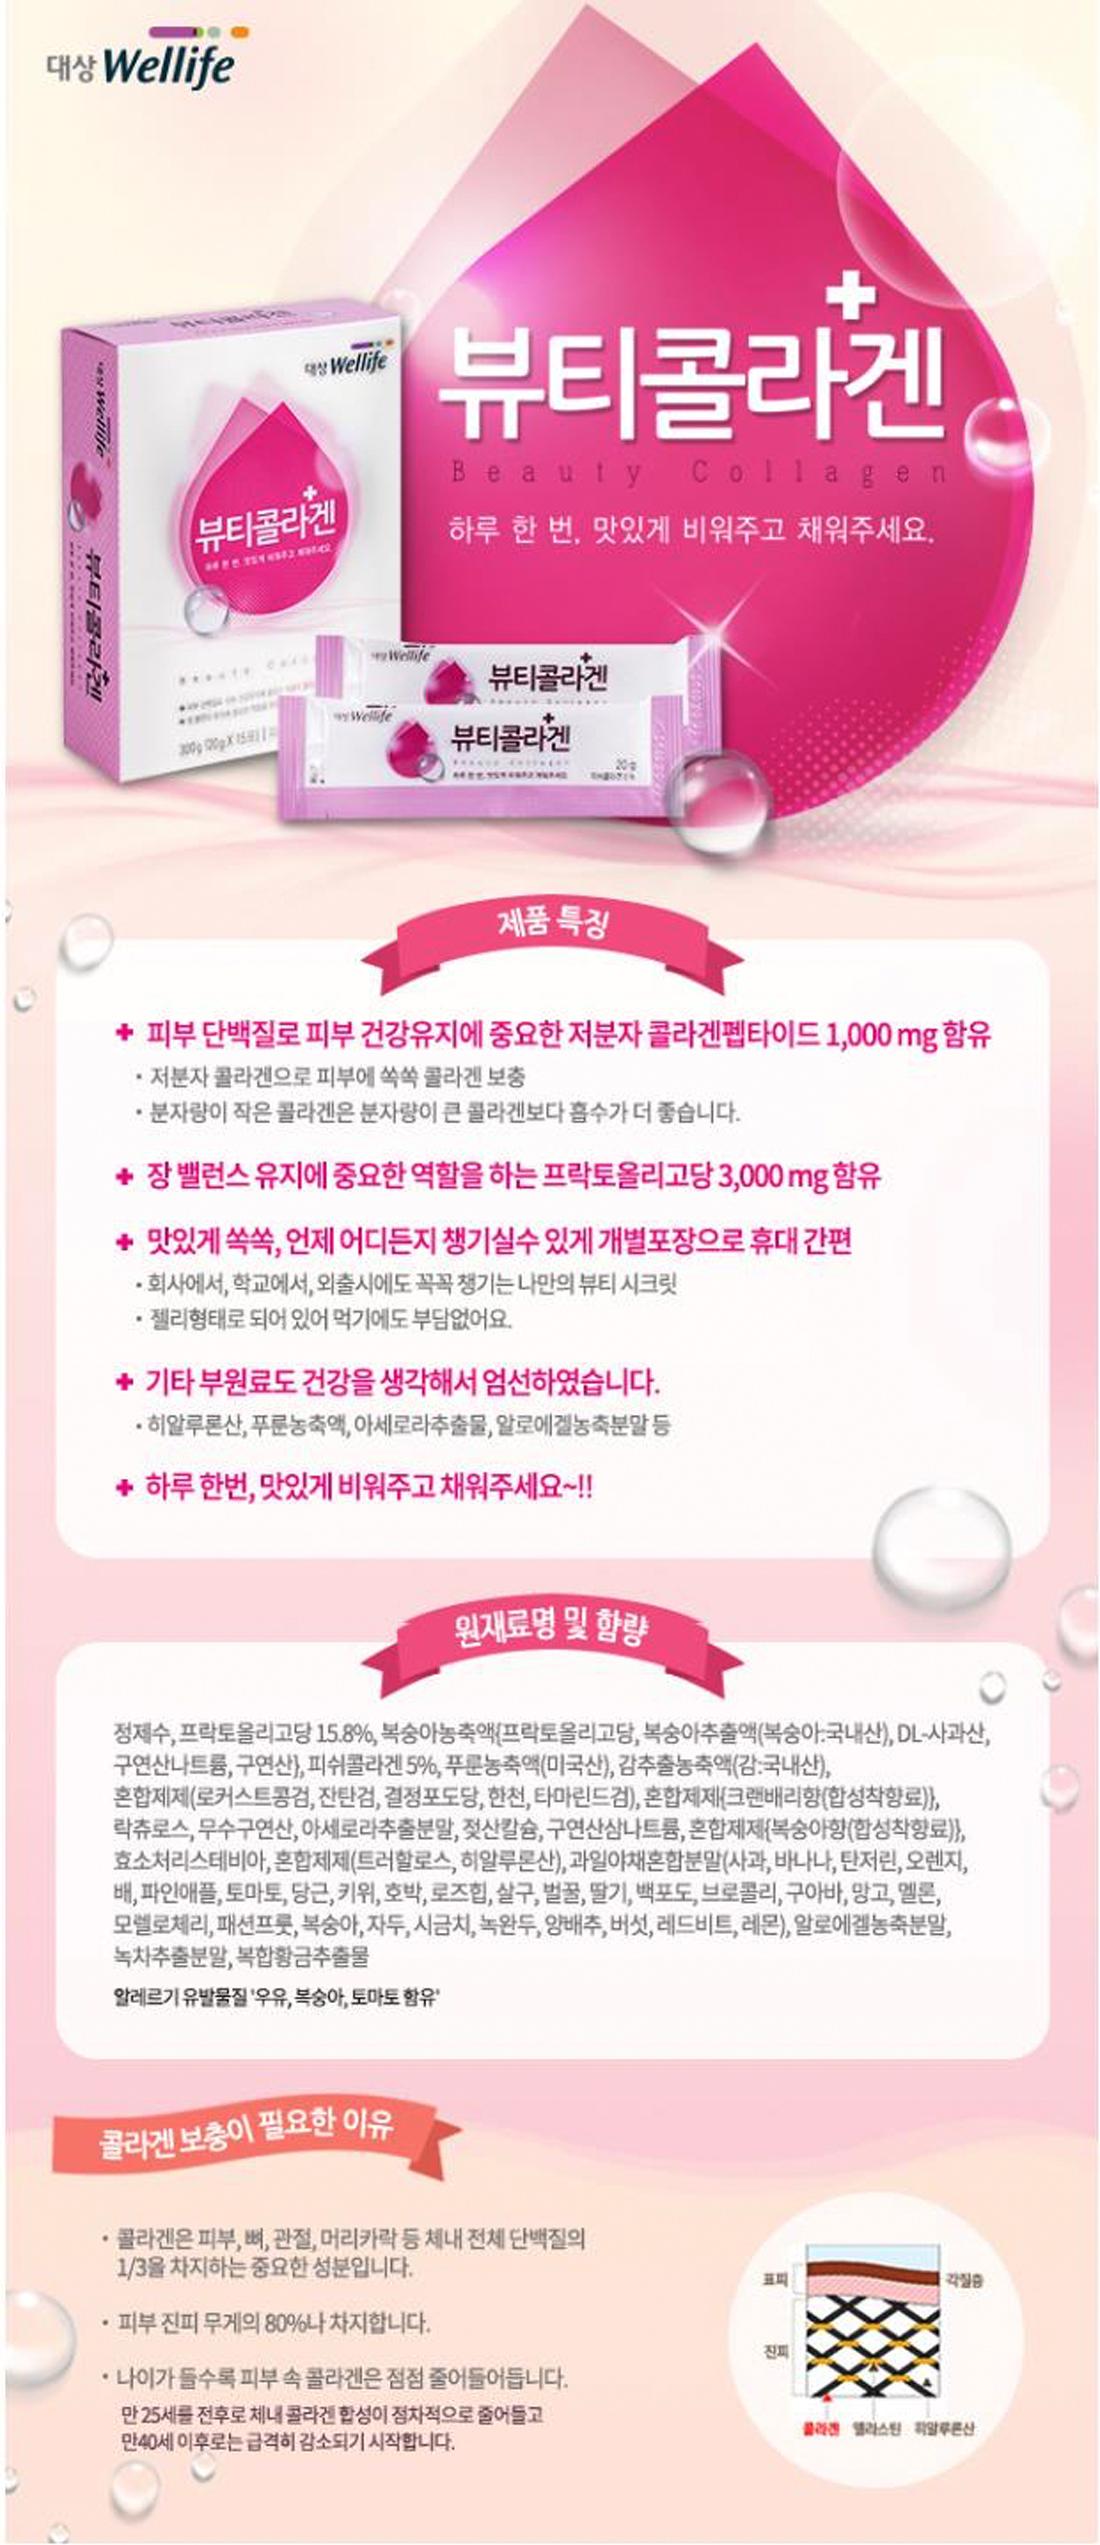 [ wellife ] Beauty Collagen X 3pcs